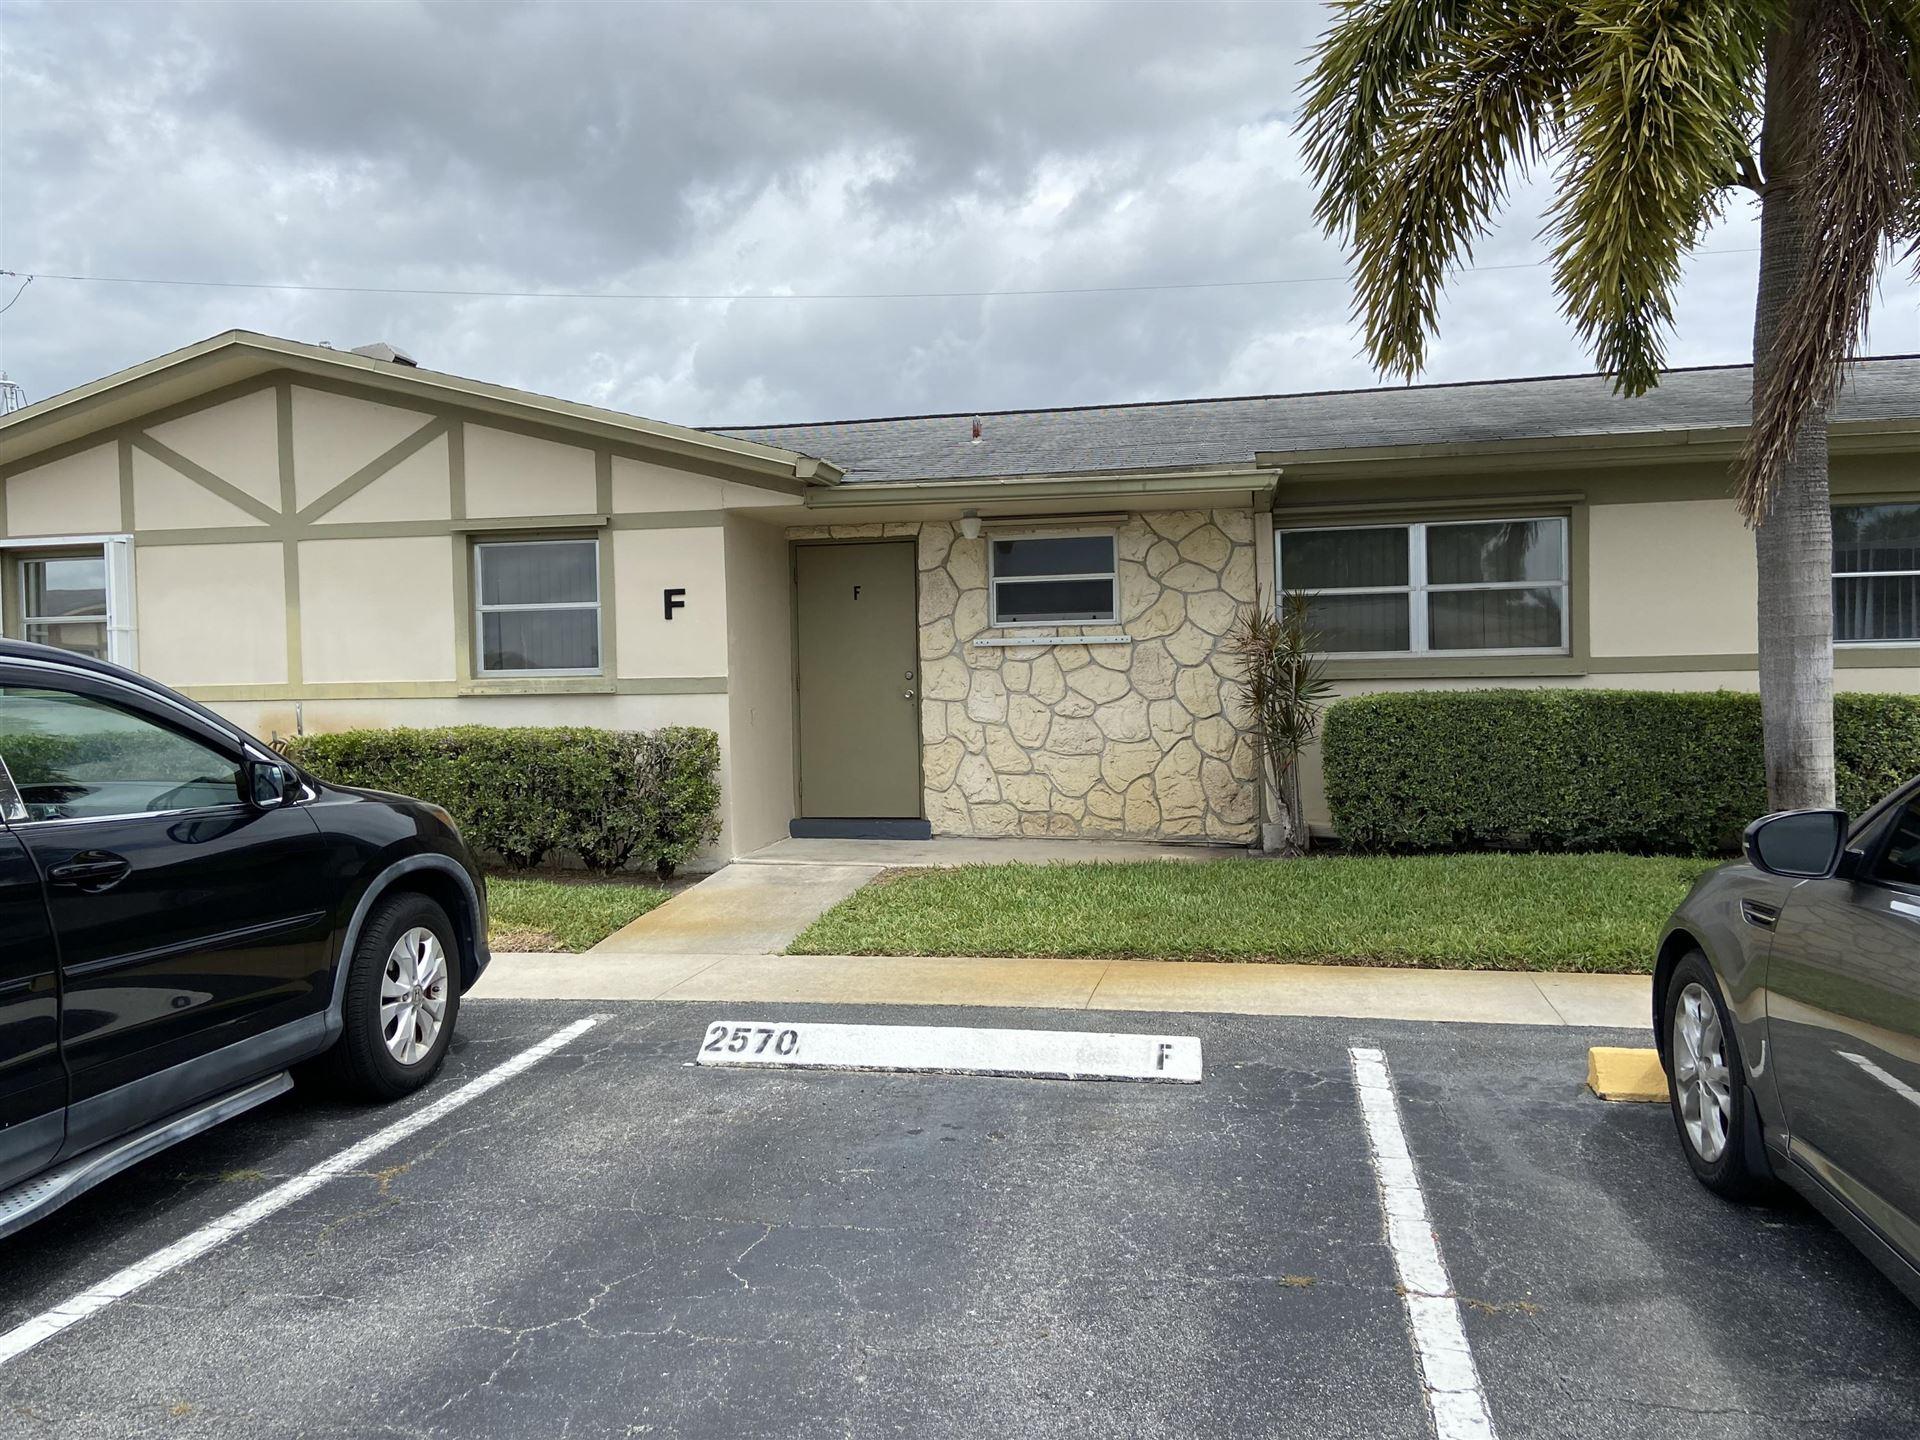 2570 Barkley Drive E #F, West Palm Beach, FL 33415 - MLS#: RX-10717105